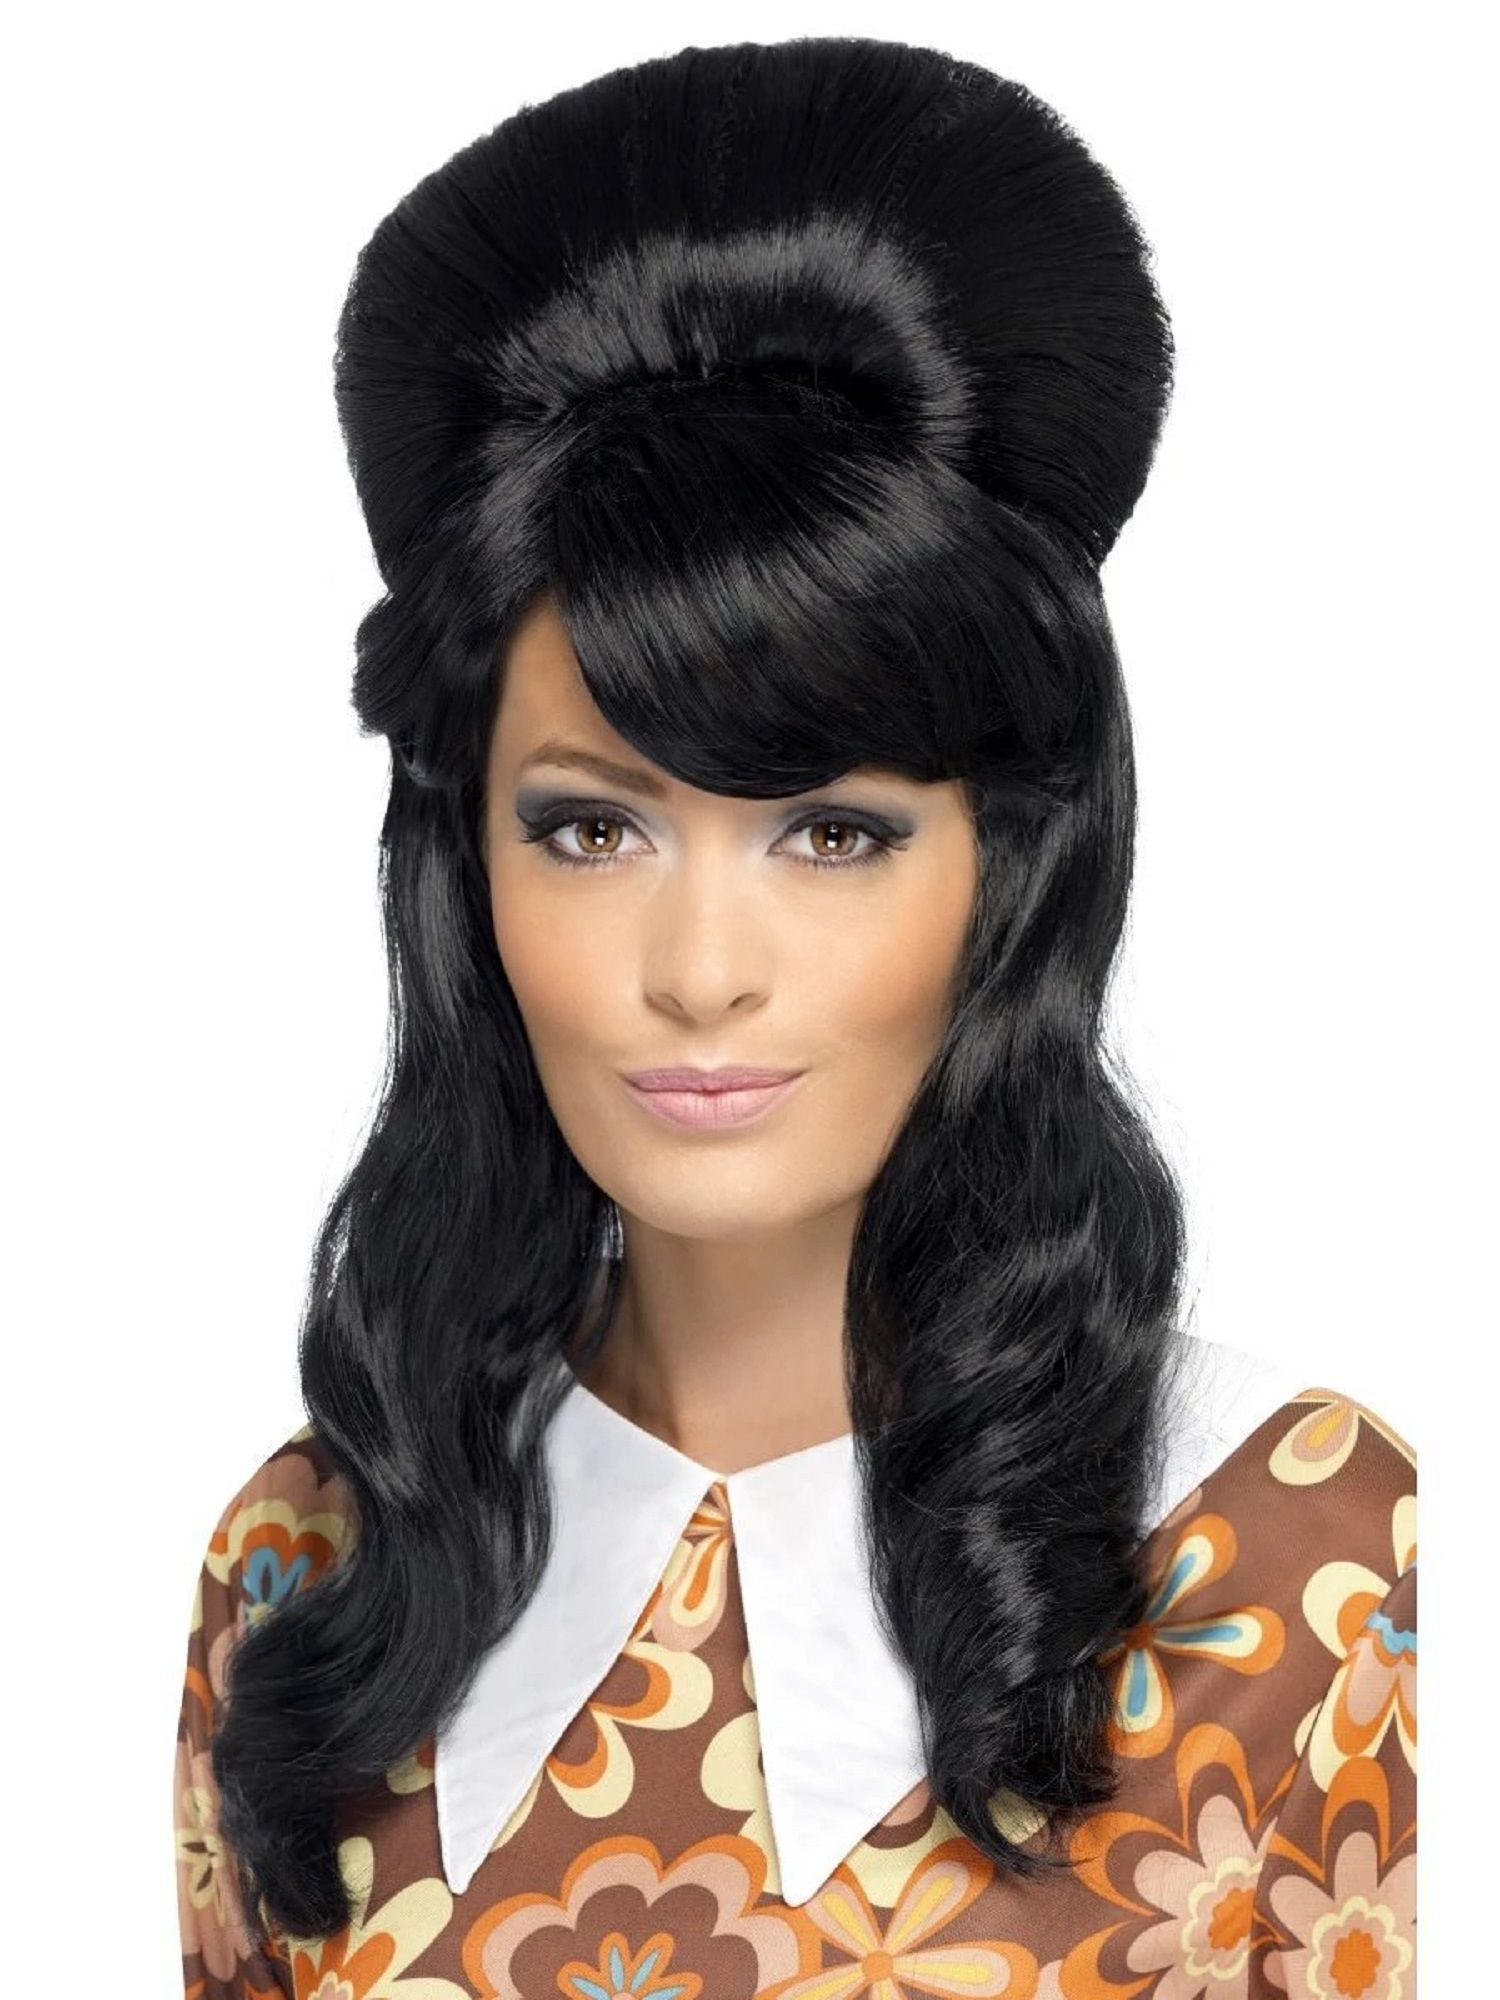 60s Mod Wig Ladies Short Groovy Black Fancy Dress Costume Accessory